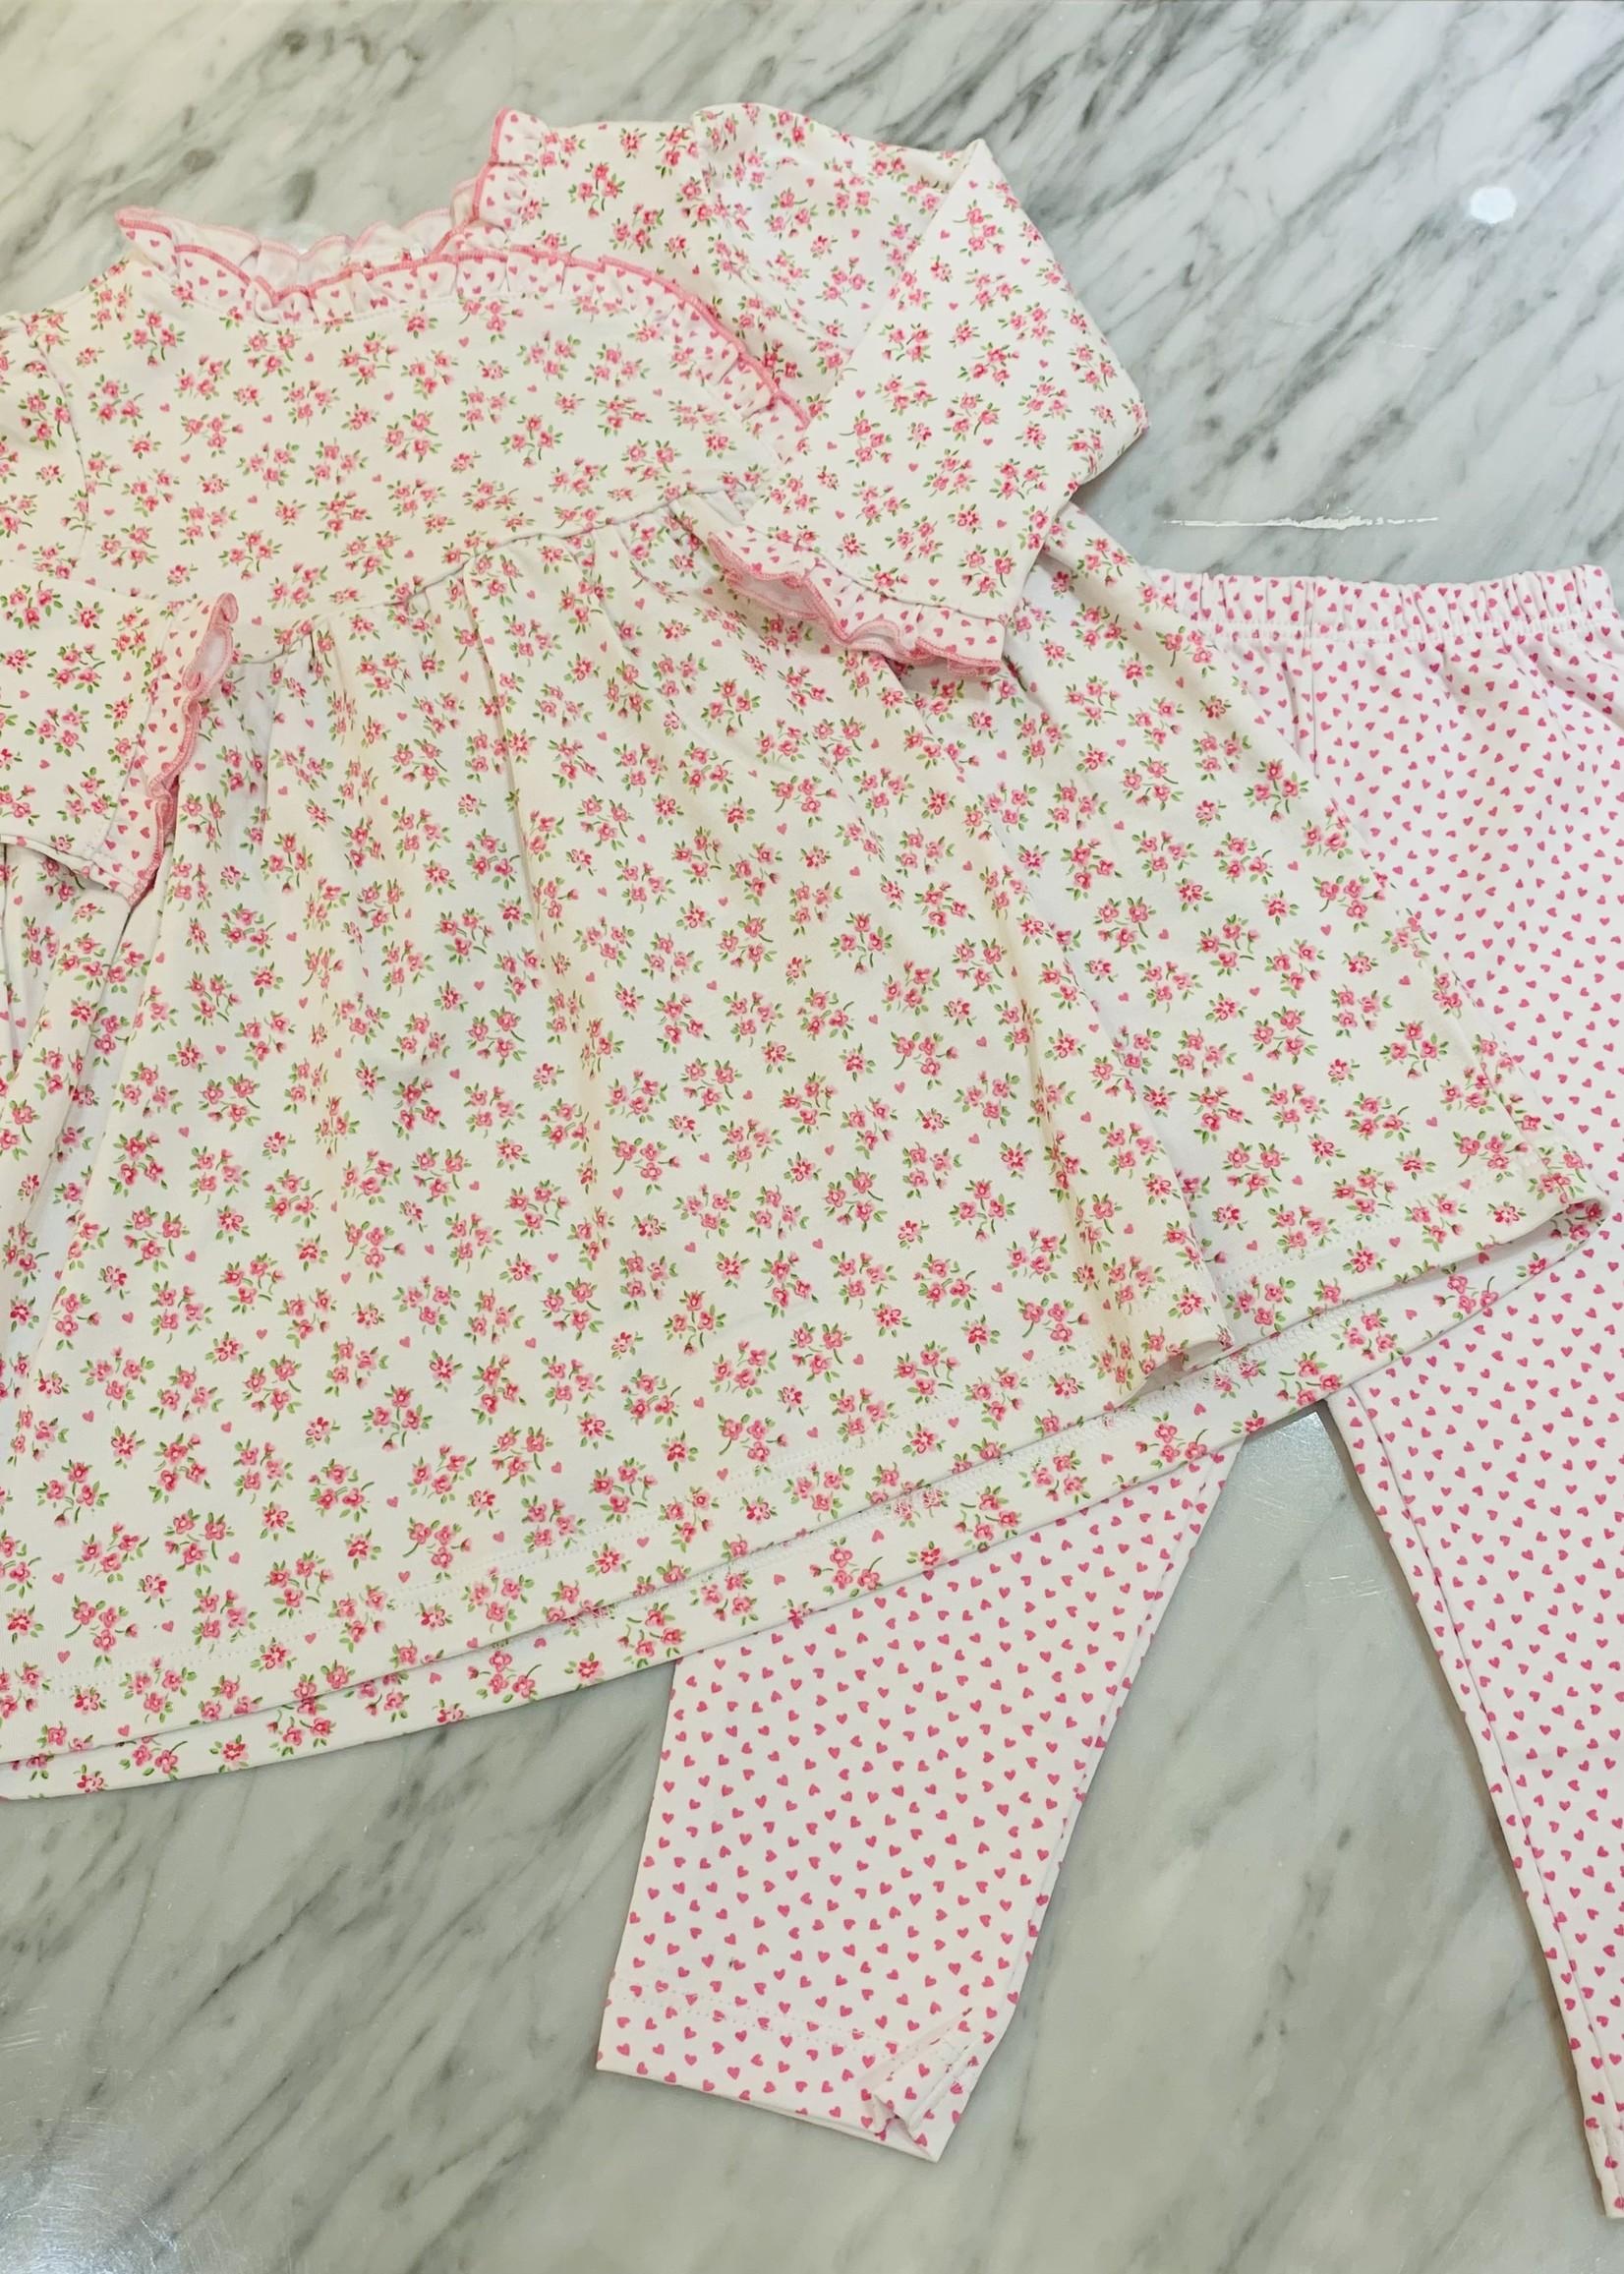 PETITE PARADISE PINK DRESS SET MIX